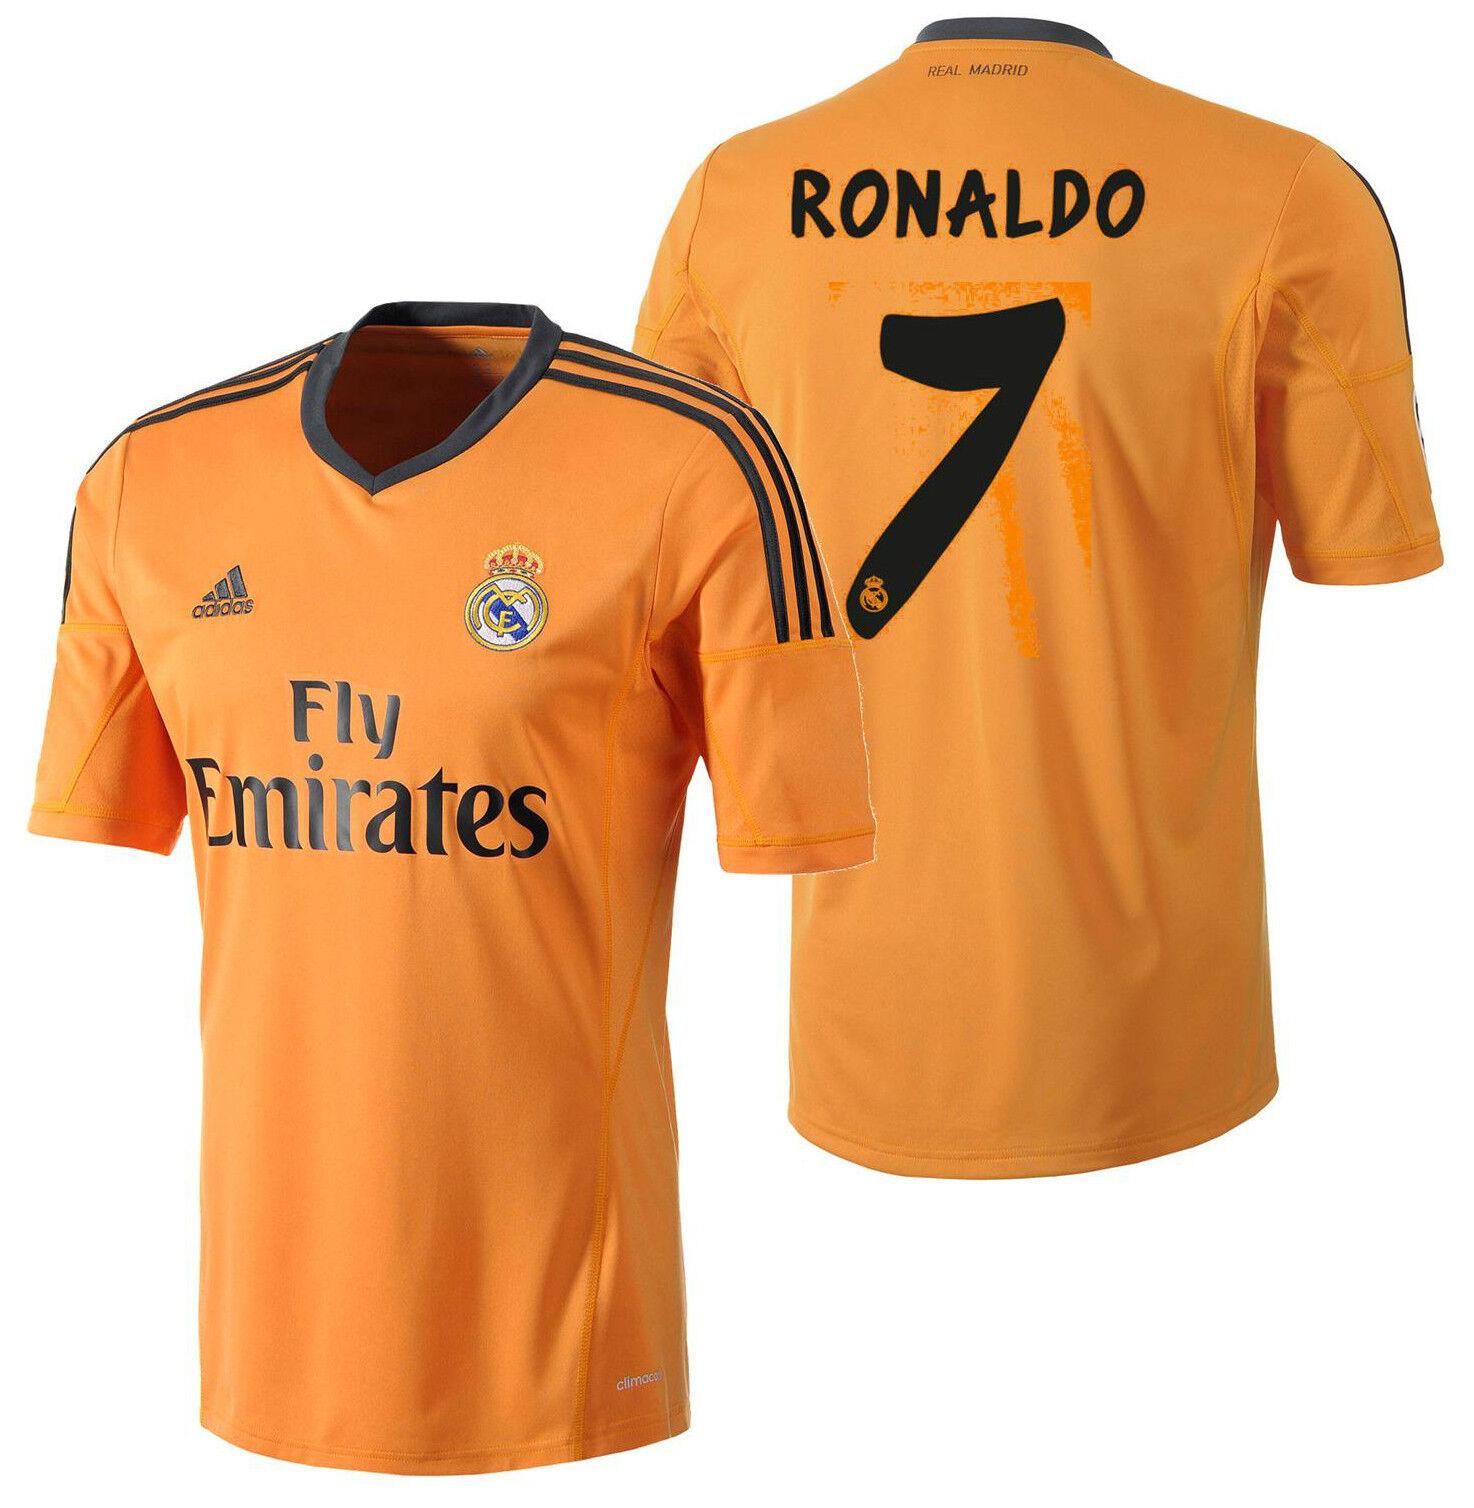 Adidas Real Madrid Cristiano Ronaldo Tercera Camiseta 2013 14